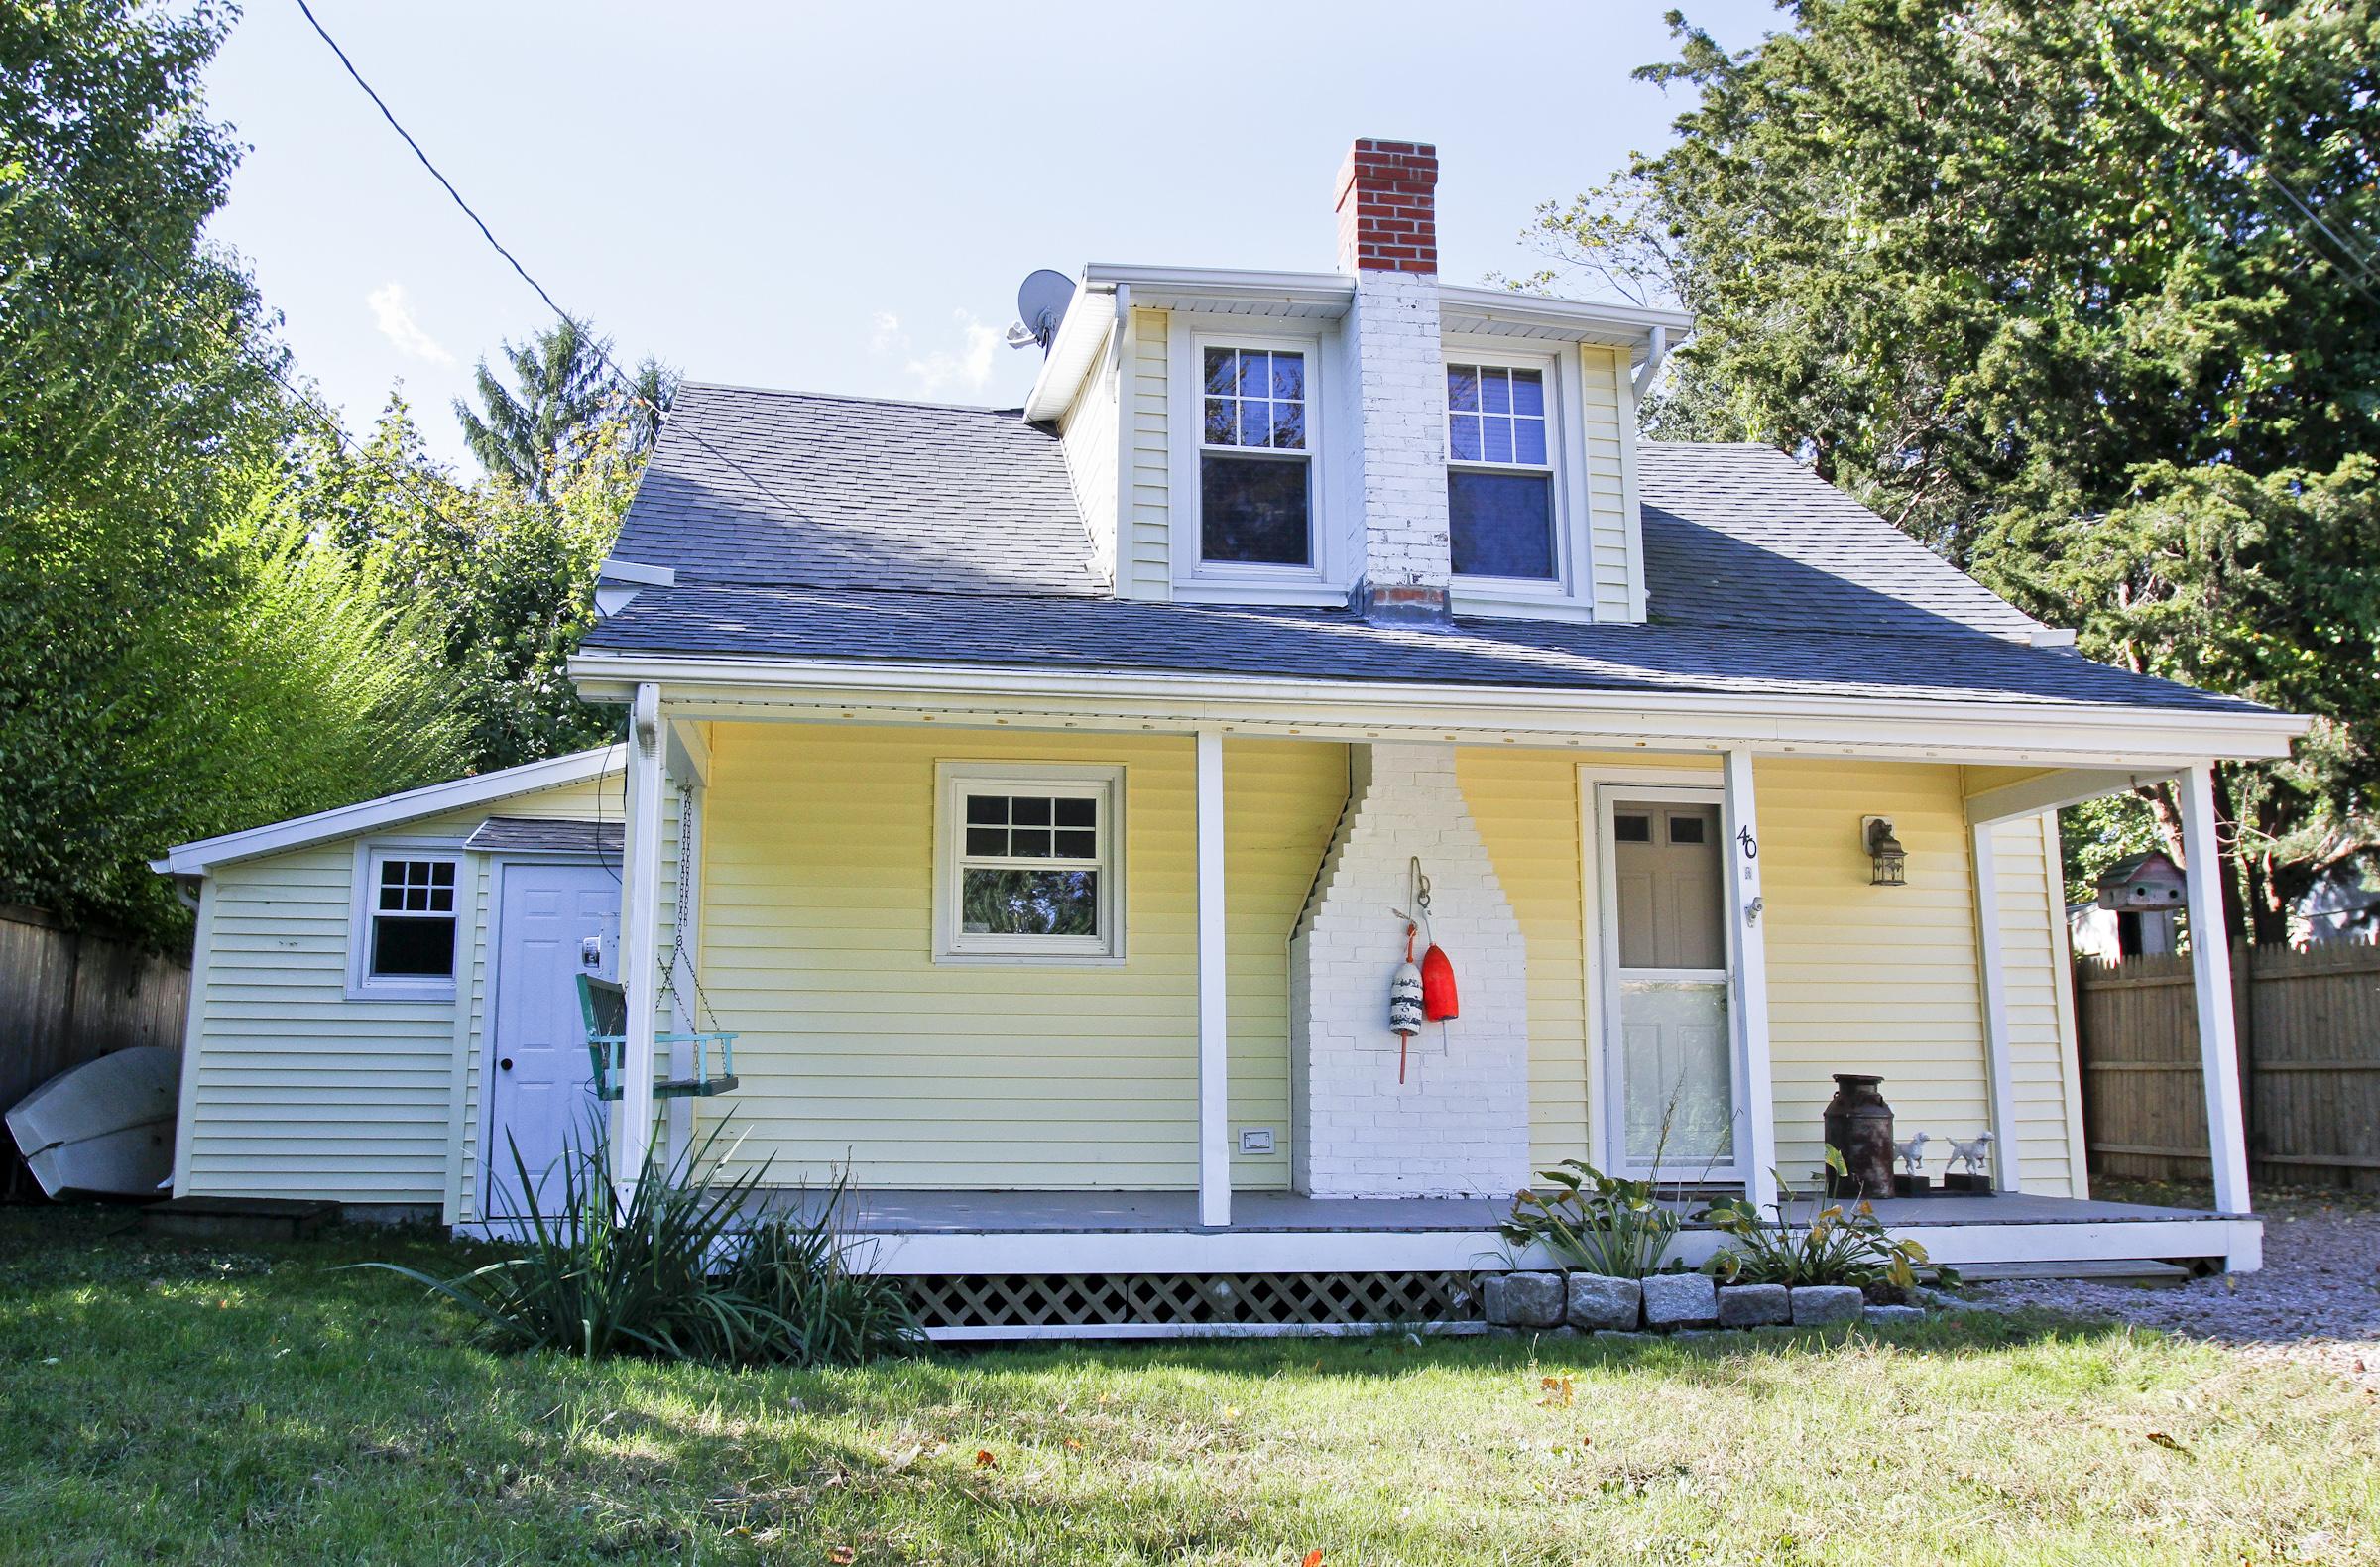 Casa Unifamiliar por un Venta en Charming Remodeled Bungalow 40a Kelsey Pl Madison, Connecticut 06443 Estados Unidos